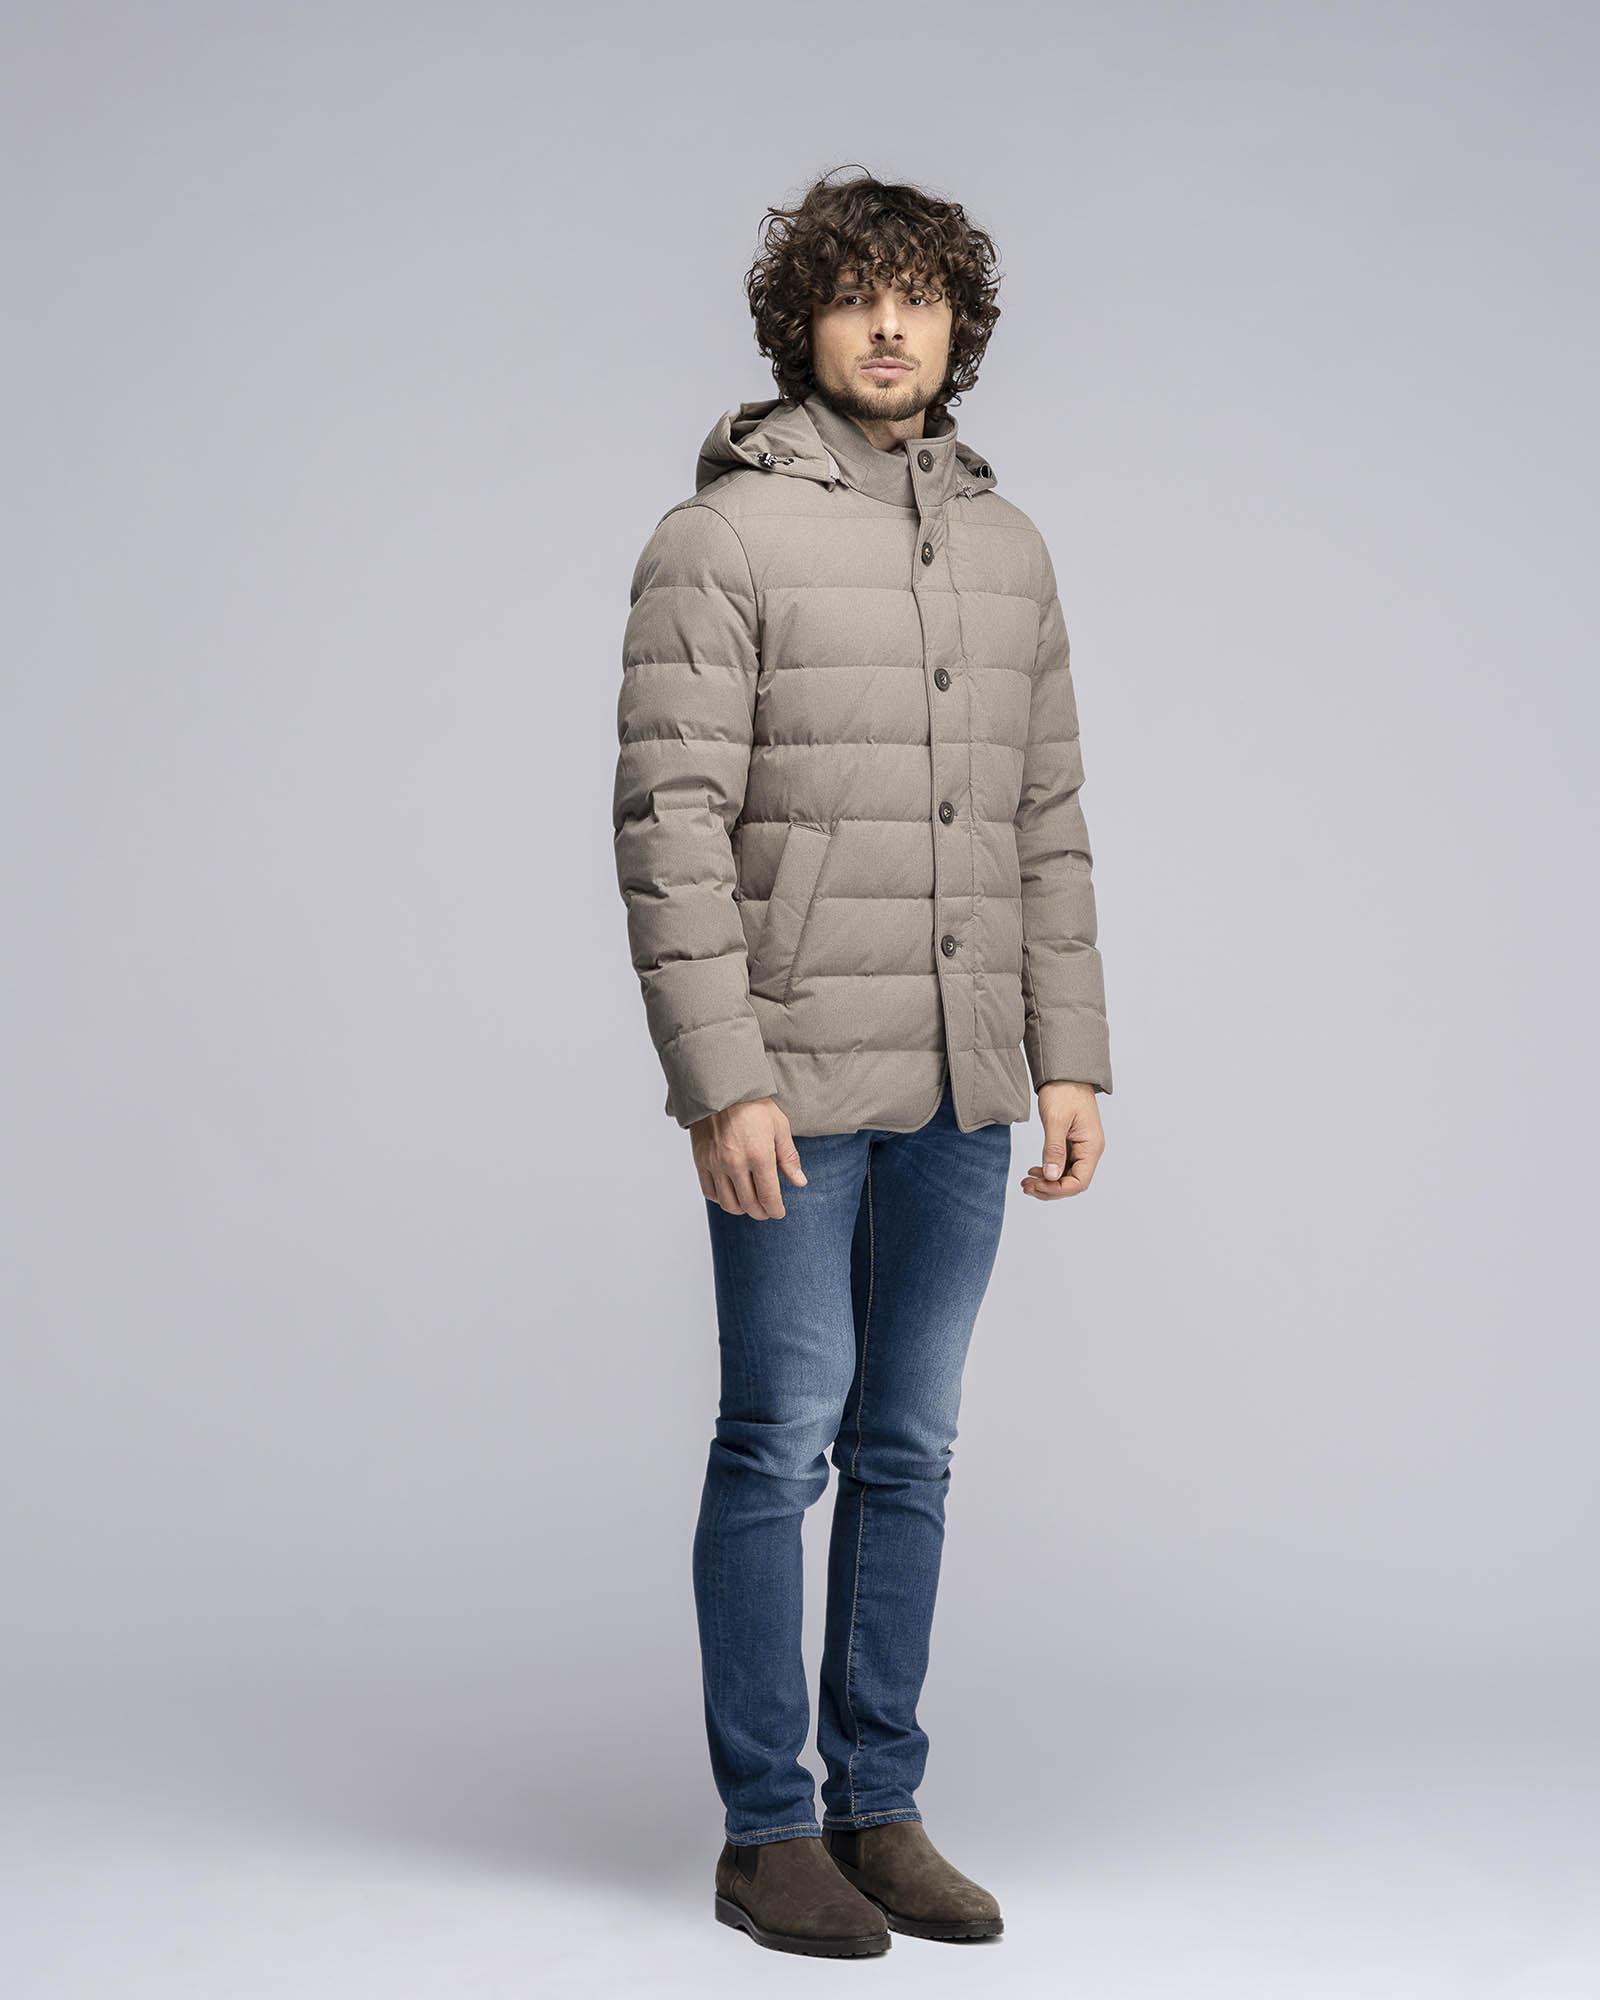 Giacca Outwear Imbottita Beige